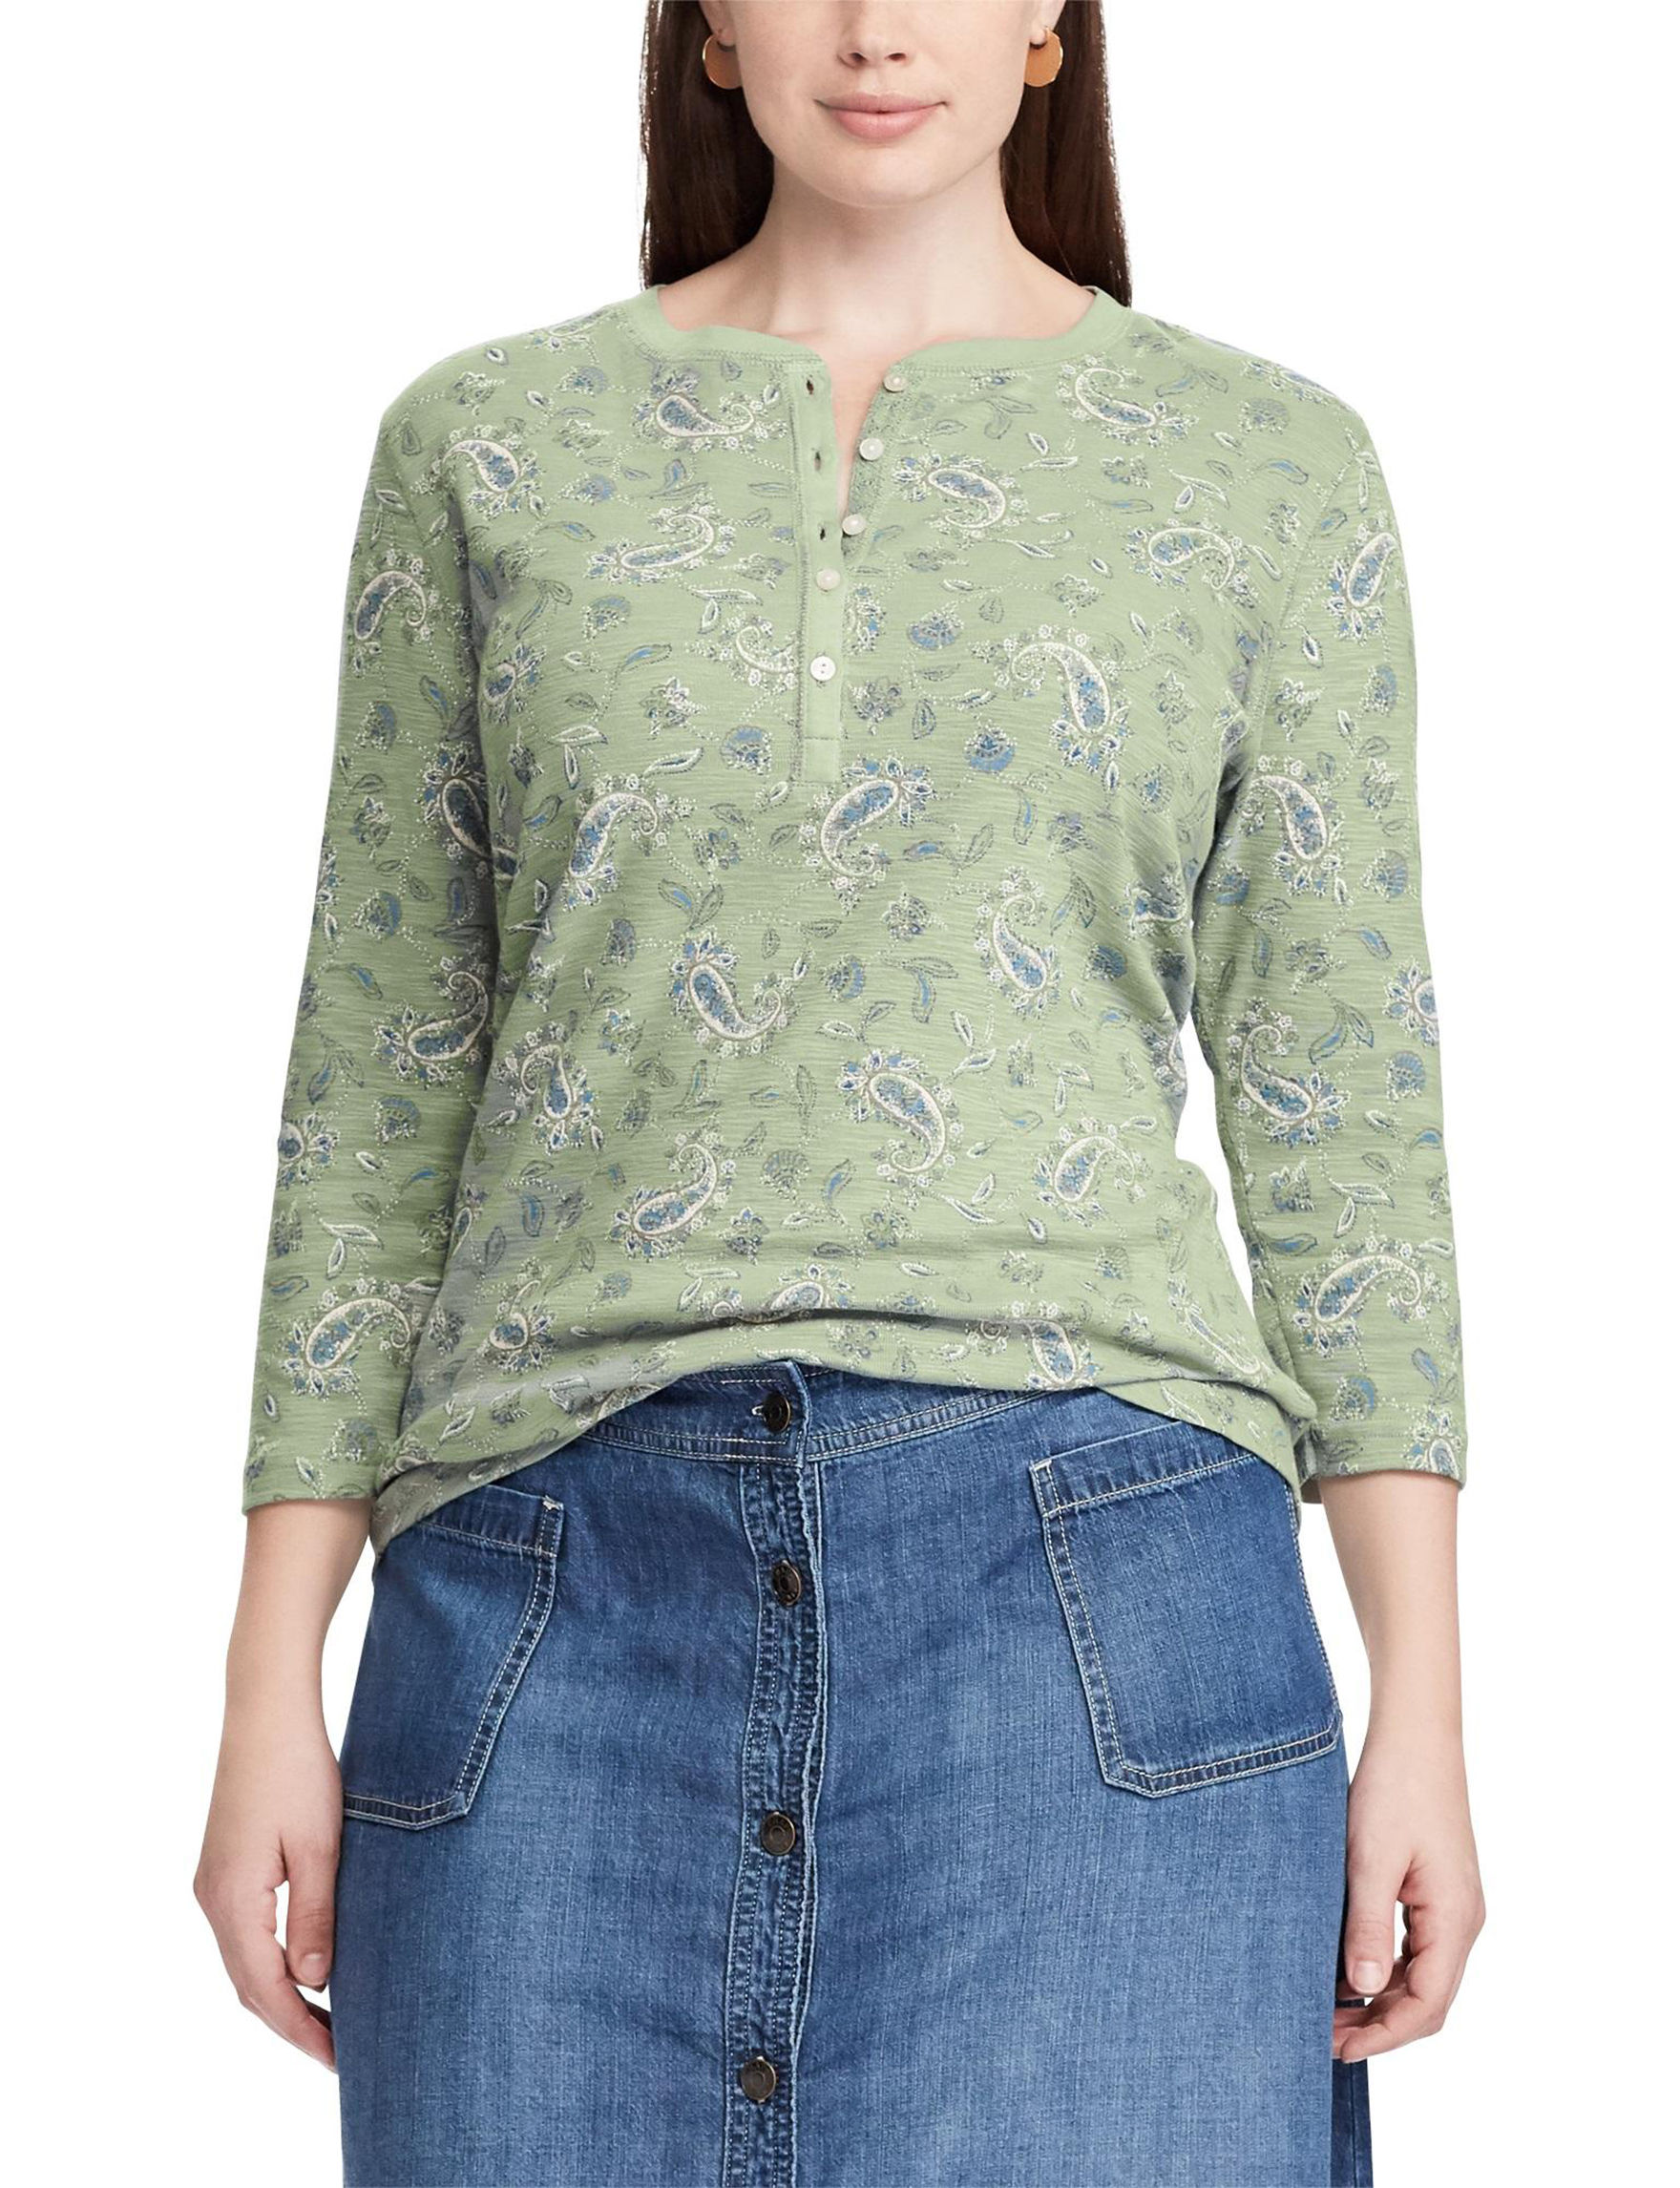 Chaps Green Multi Shirts & Blouses